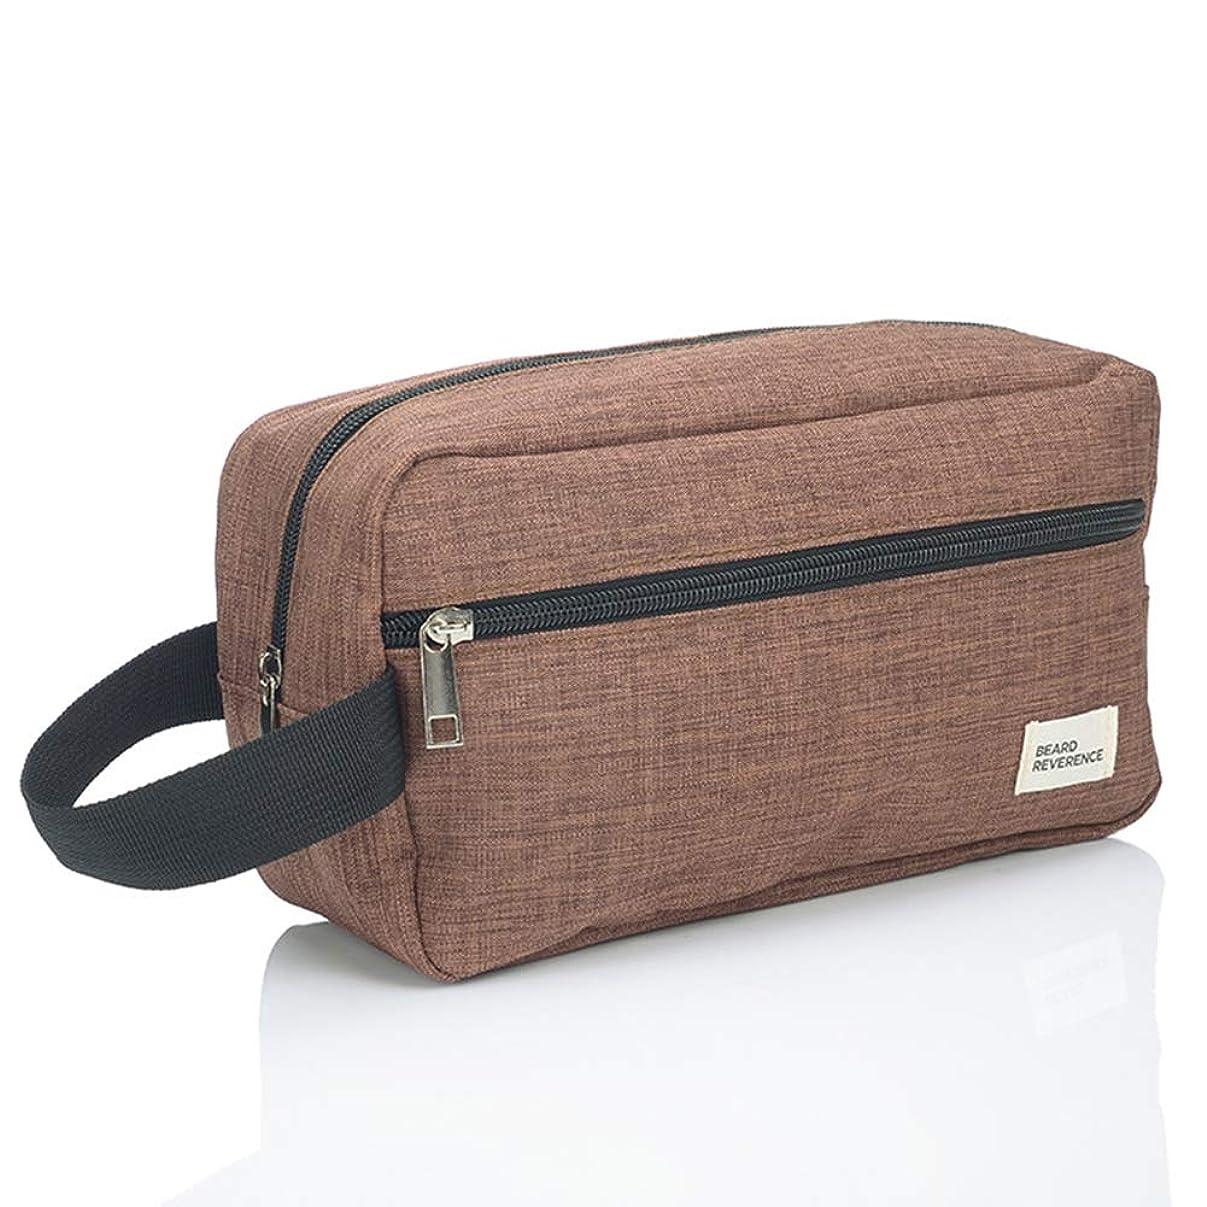 ACHICOO 化粧品ケース 化粧品バッグ 大容量 二層 洗濯 洗面用品キット 防水 持ち運び便利 旅行 アートドア 女性 男性 メイクアップケース フロストコーヒー